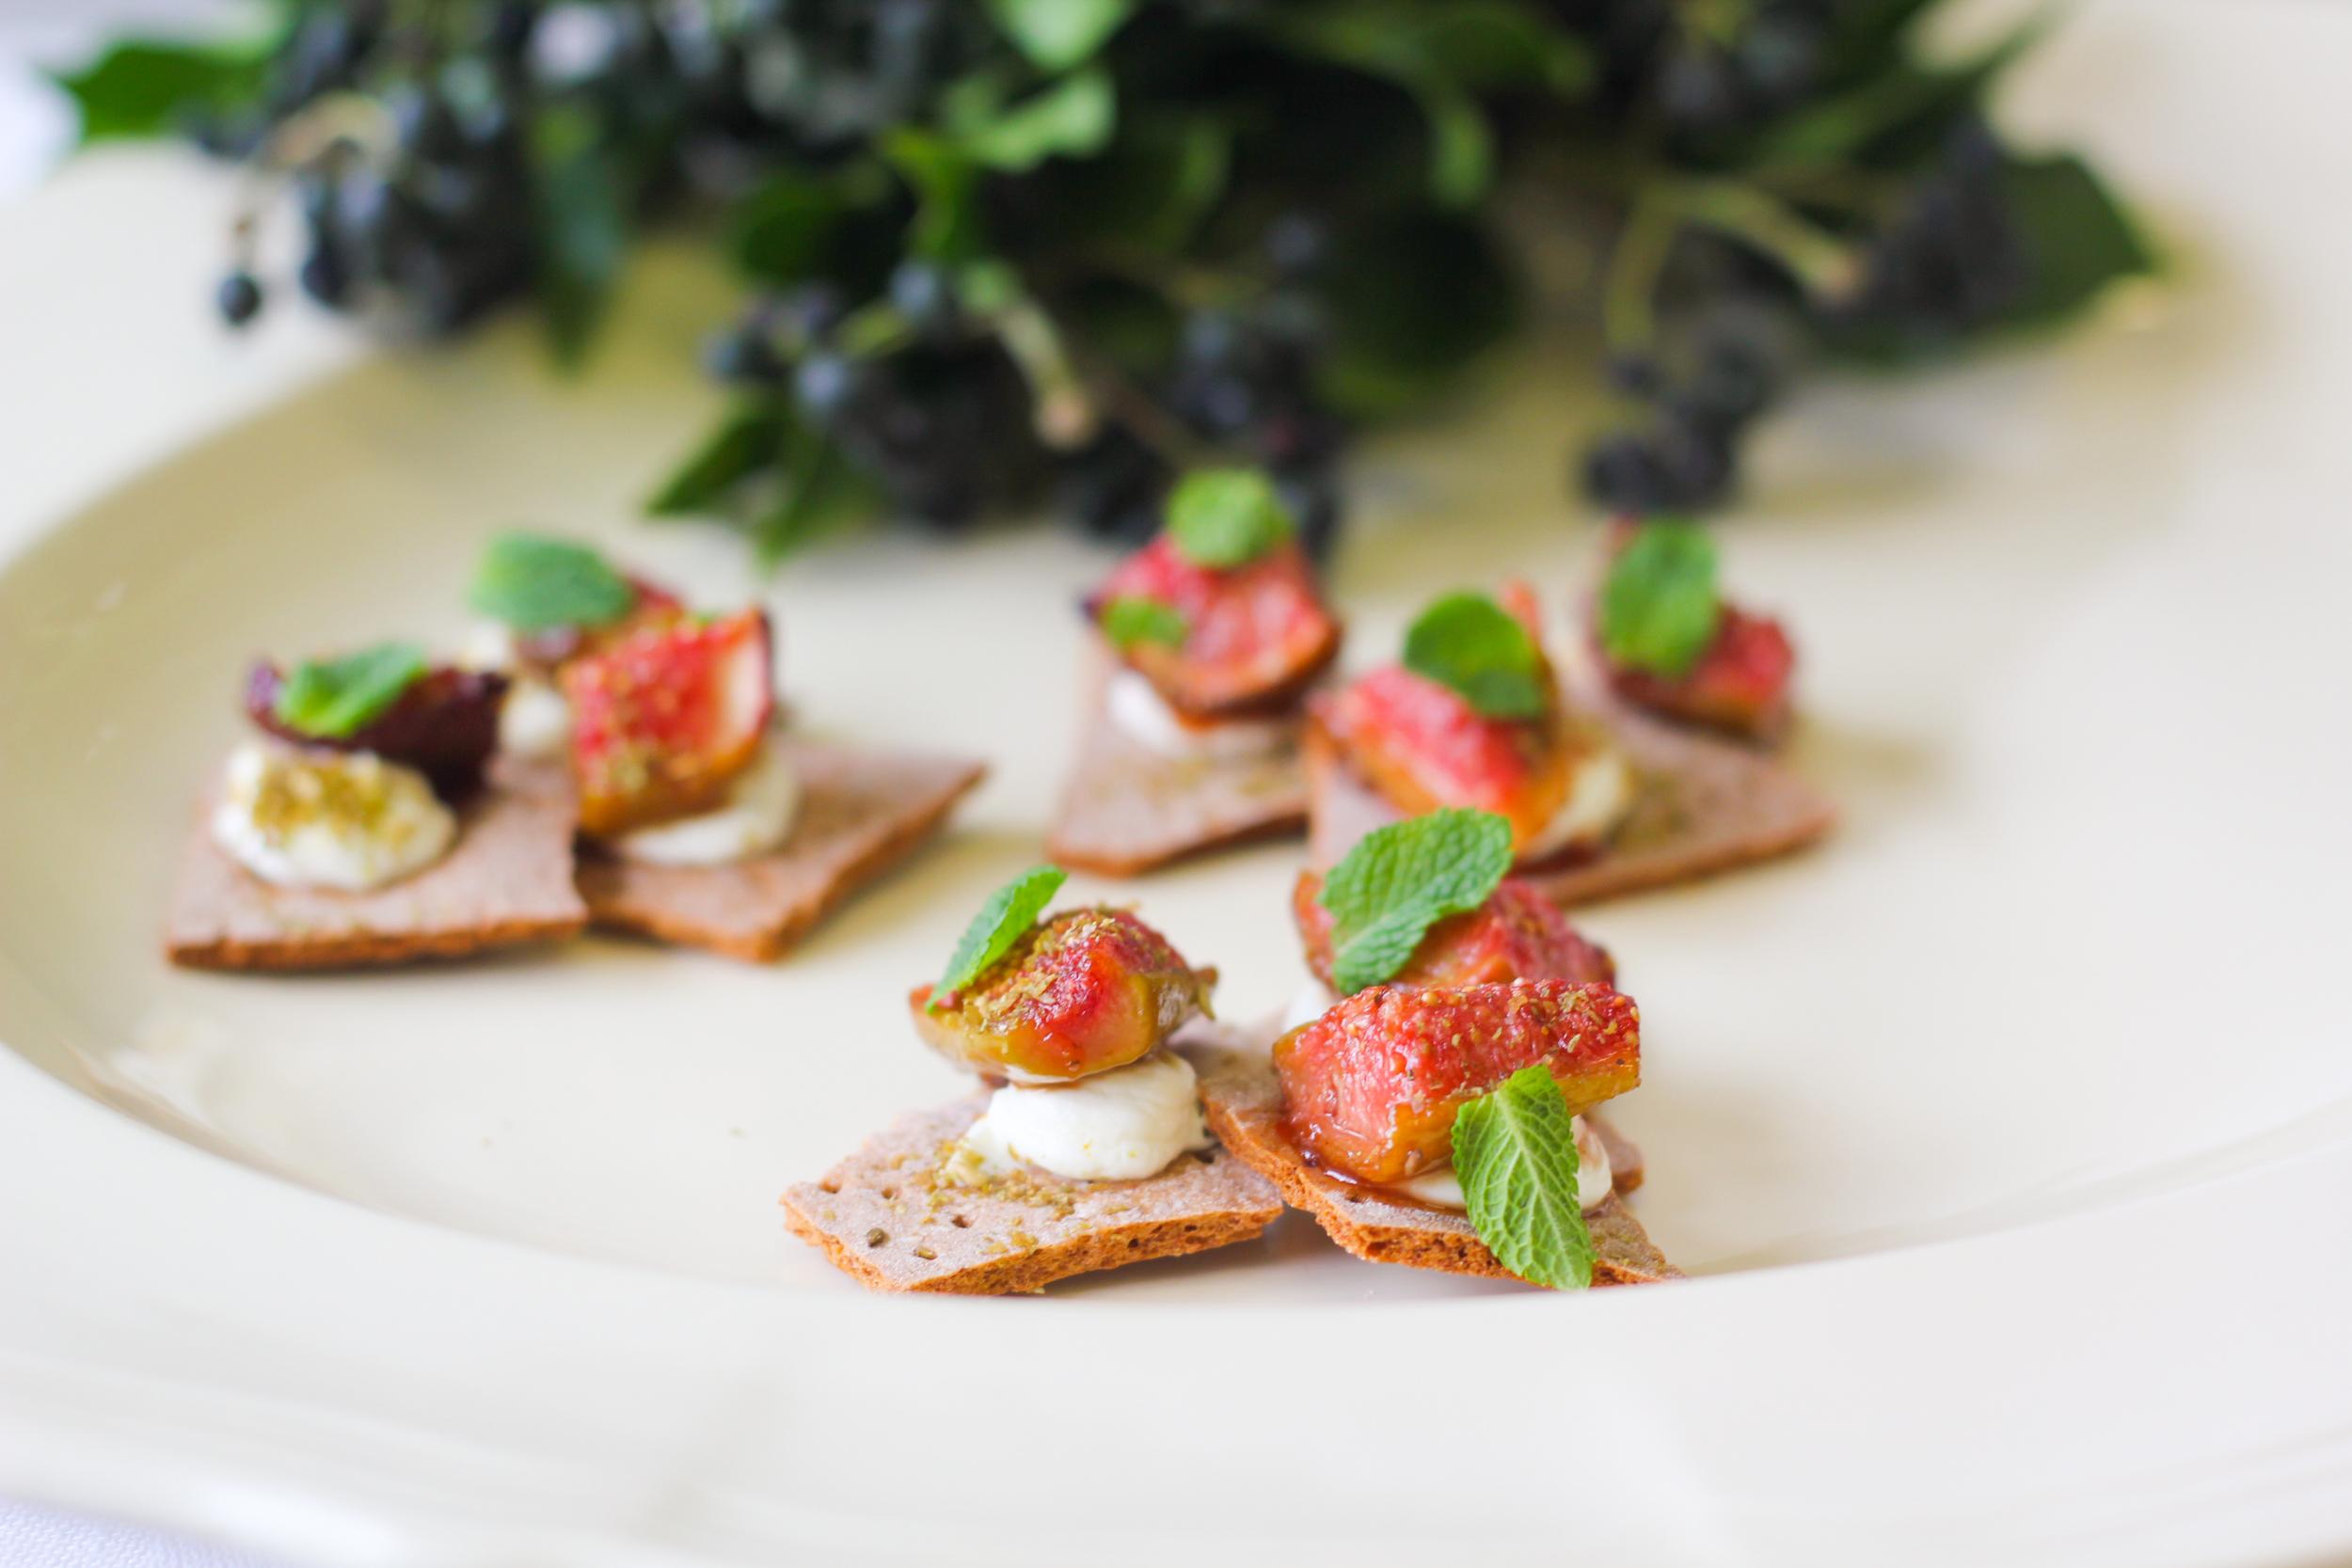 Grilled figs, labneh, zatar & mint